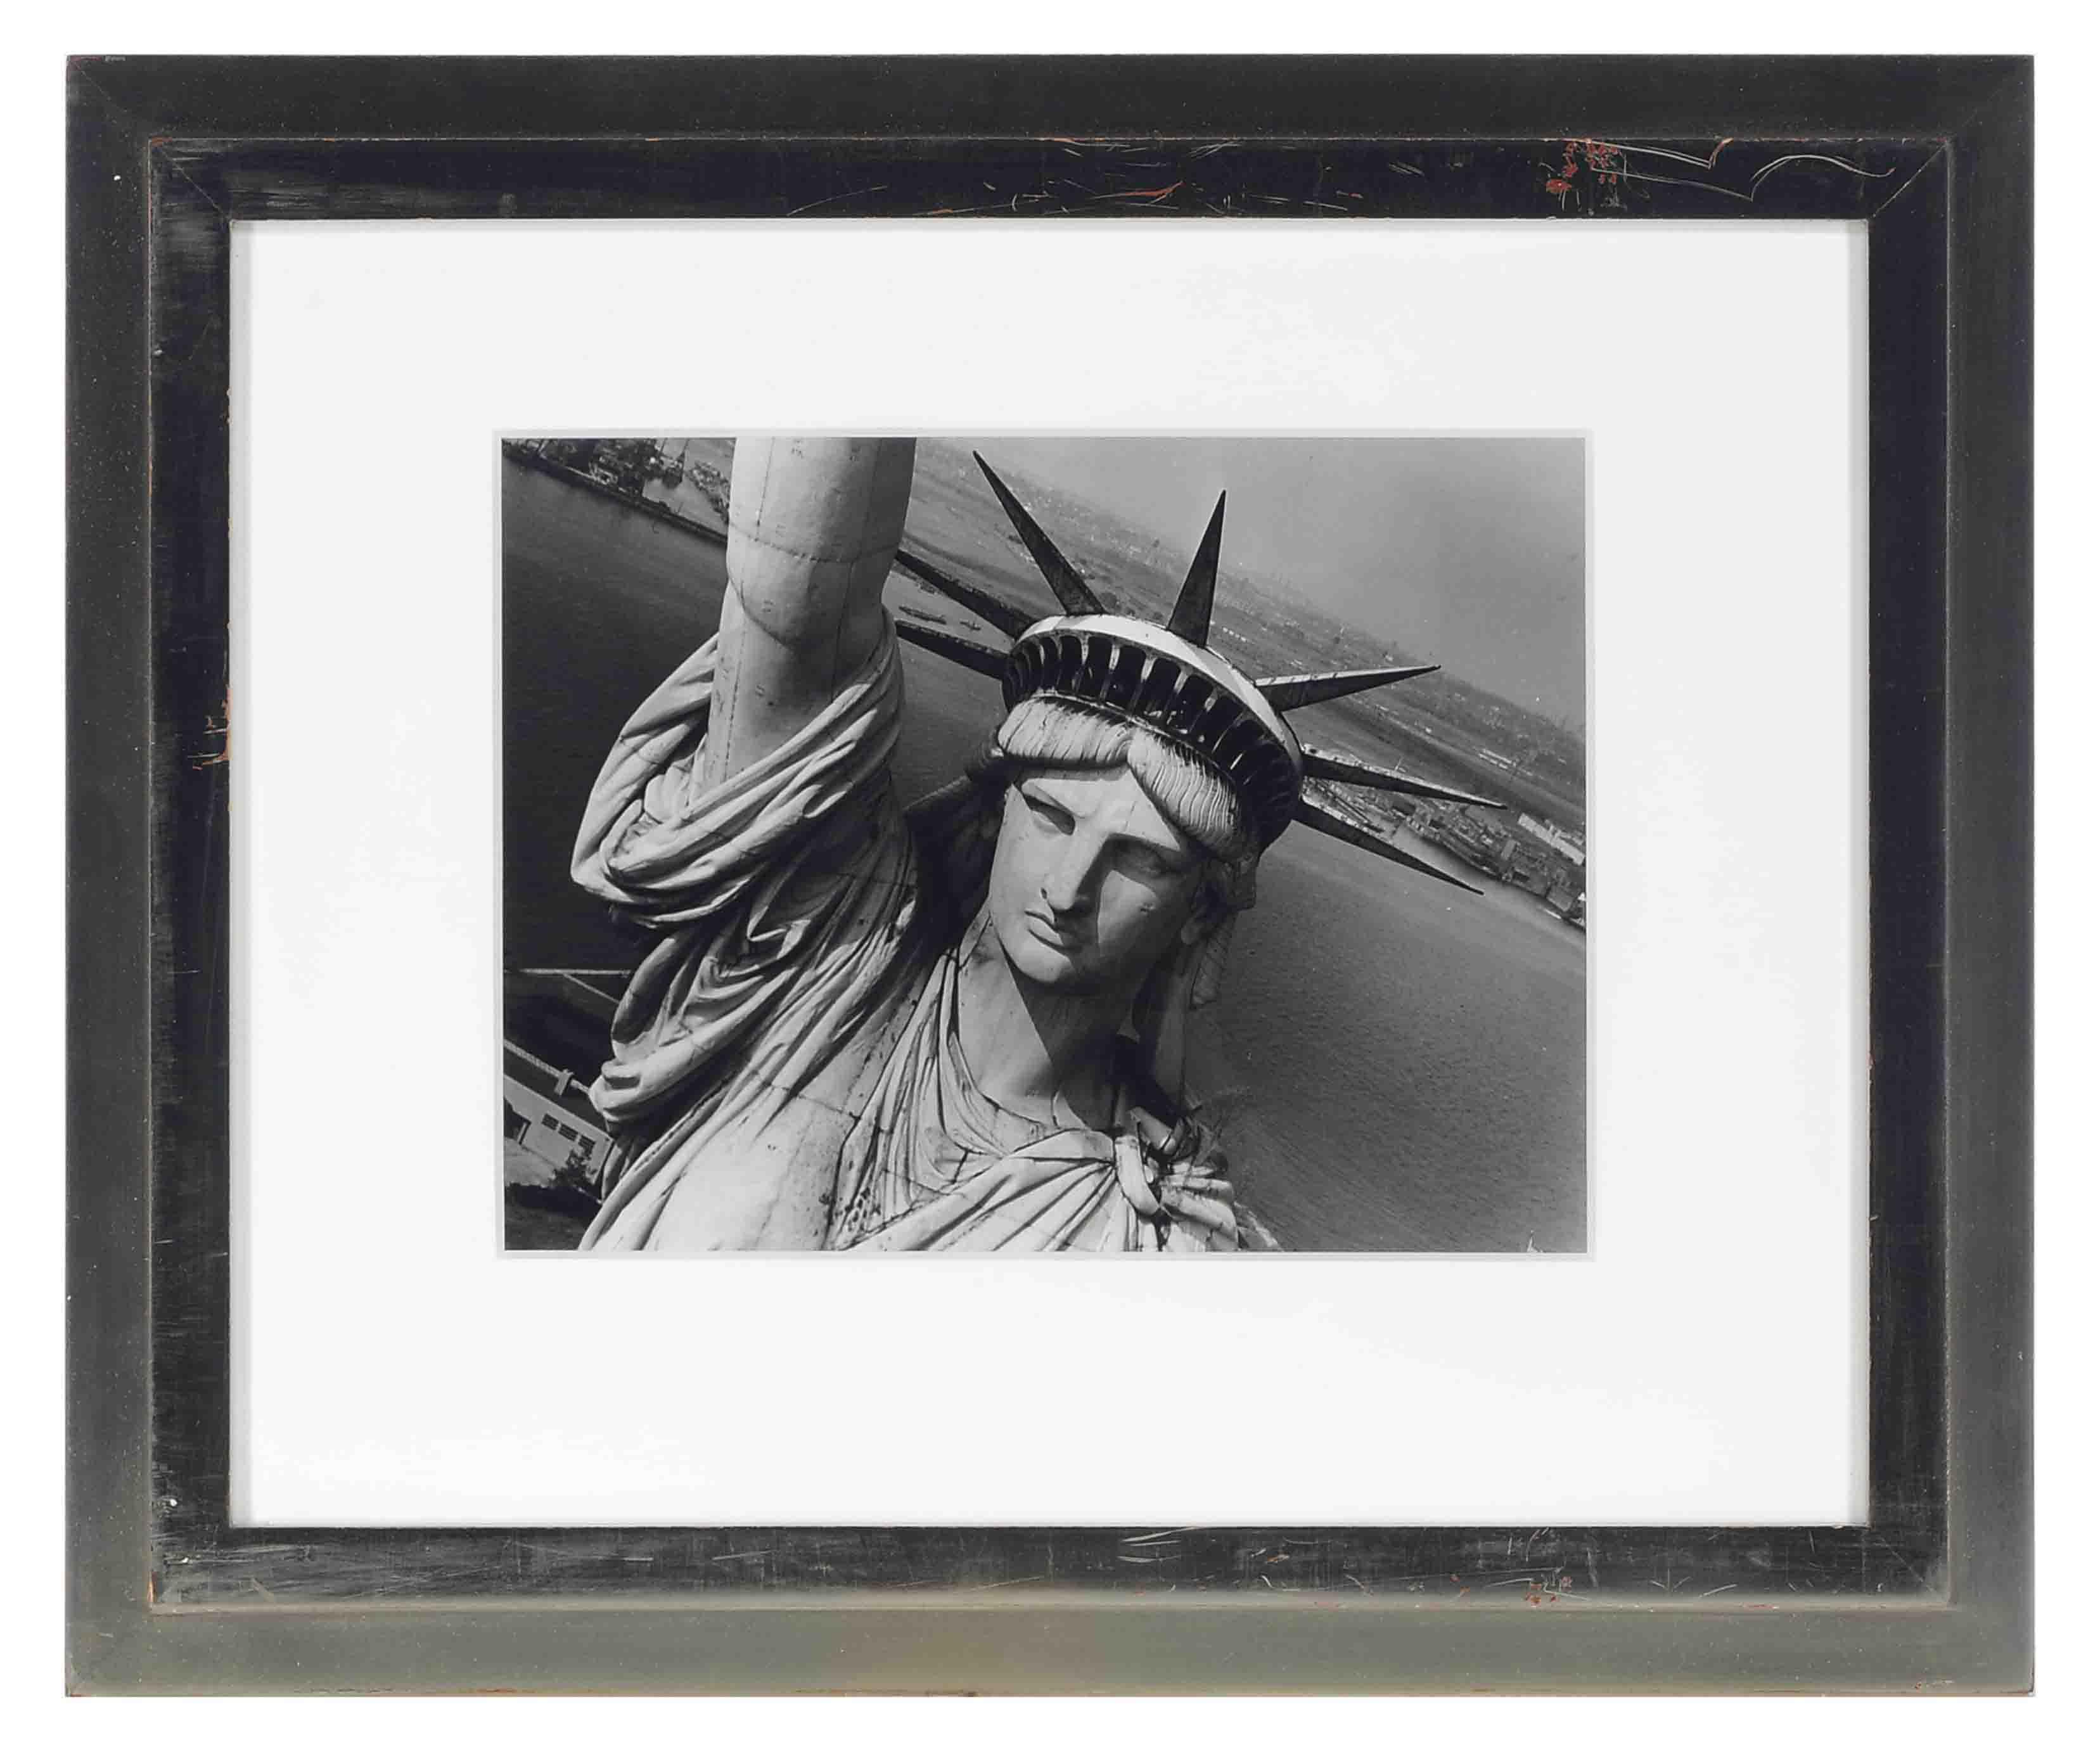 Closeup Aerial Photo of Statue of Liberty, circa 1948